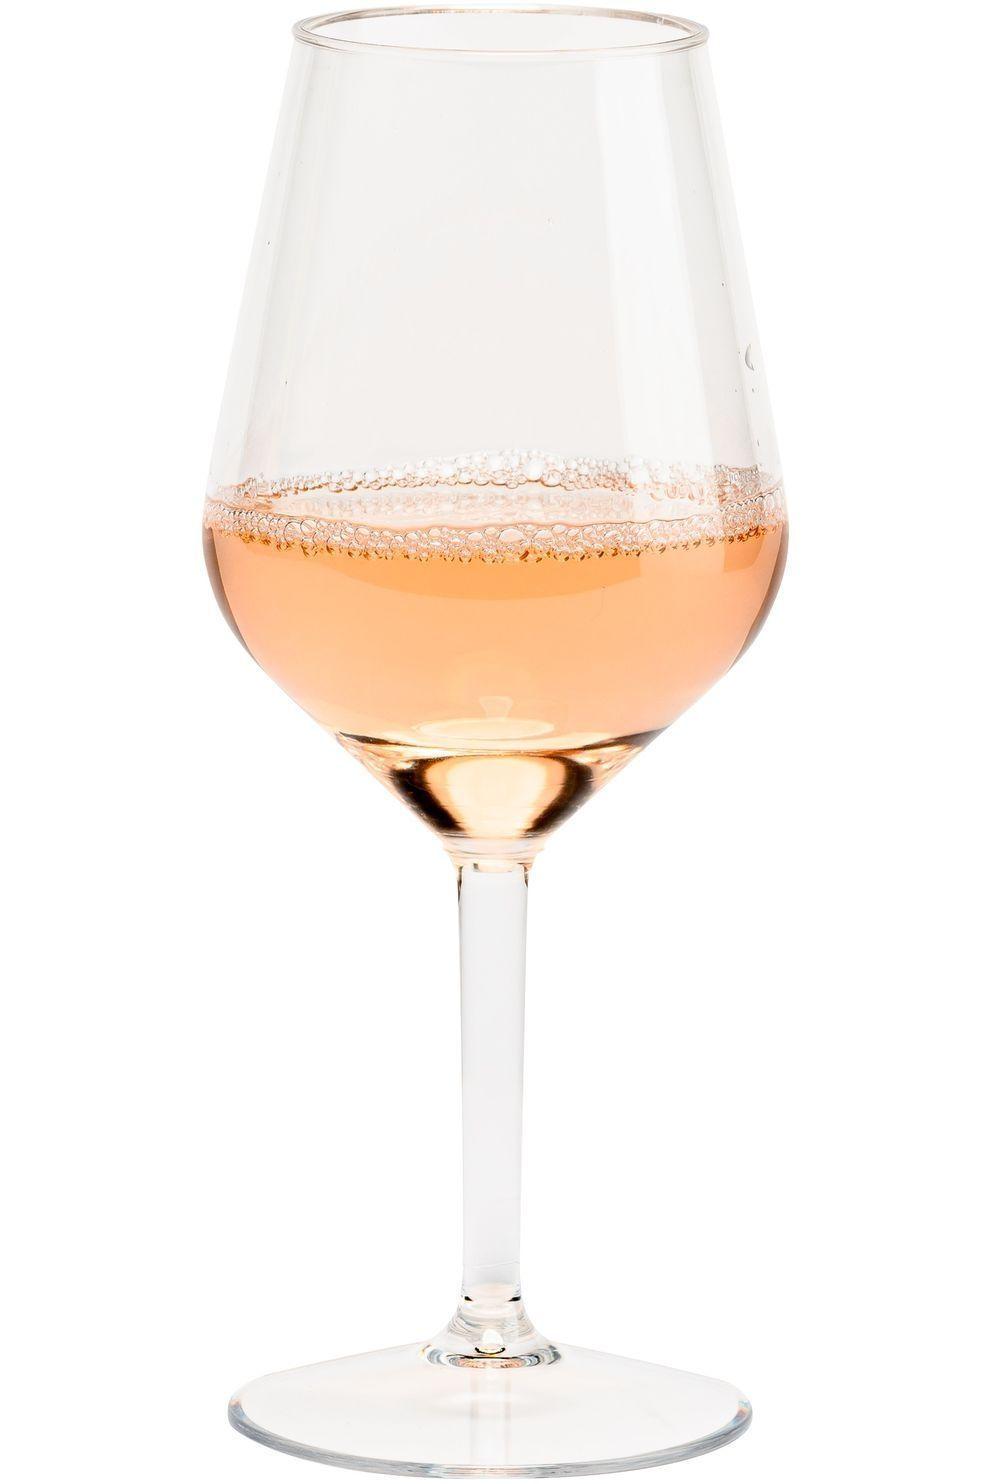 Festicup Abigail Wine Glass - / Transparant - Nieuwe Collectie